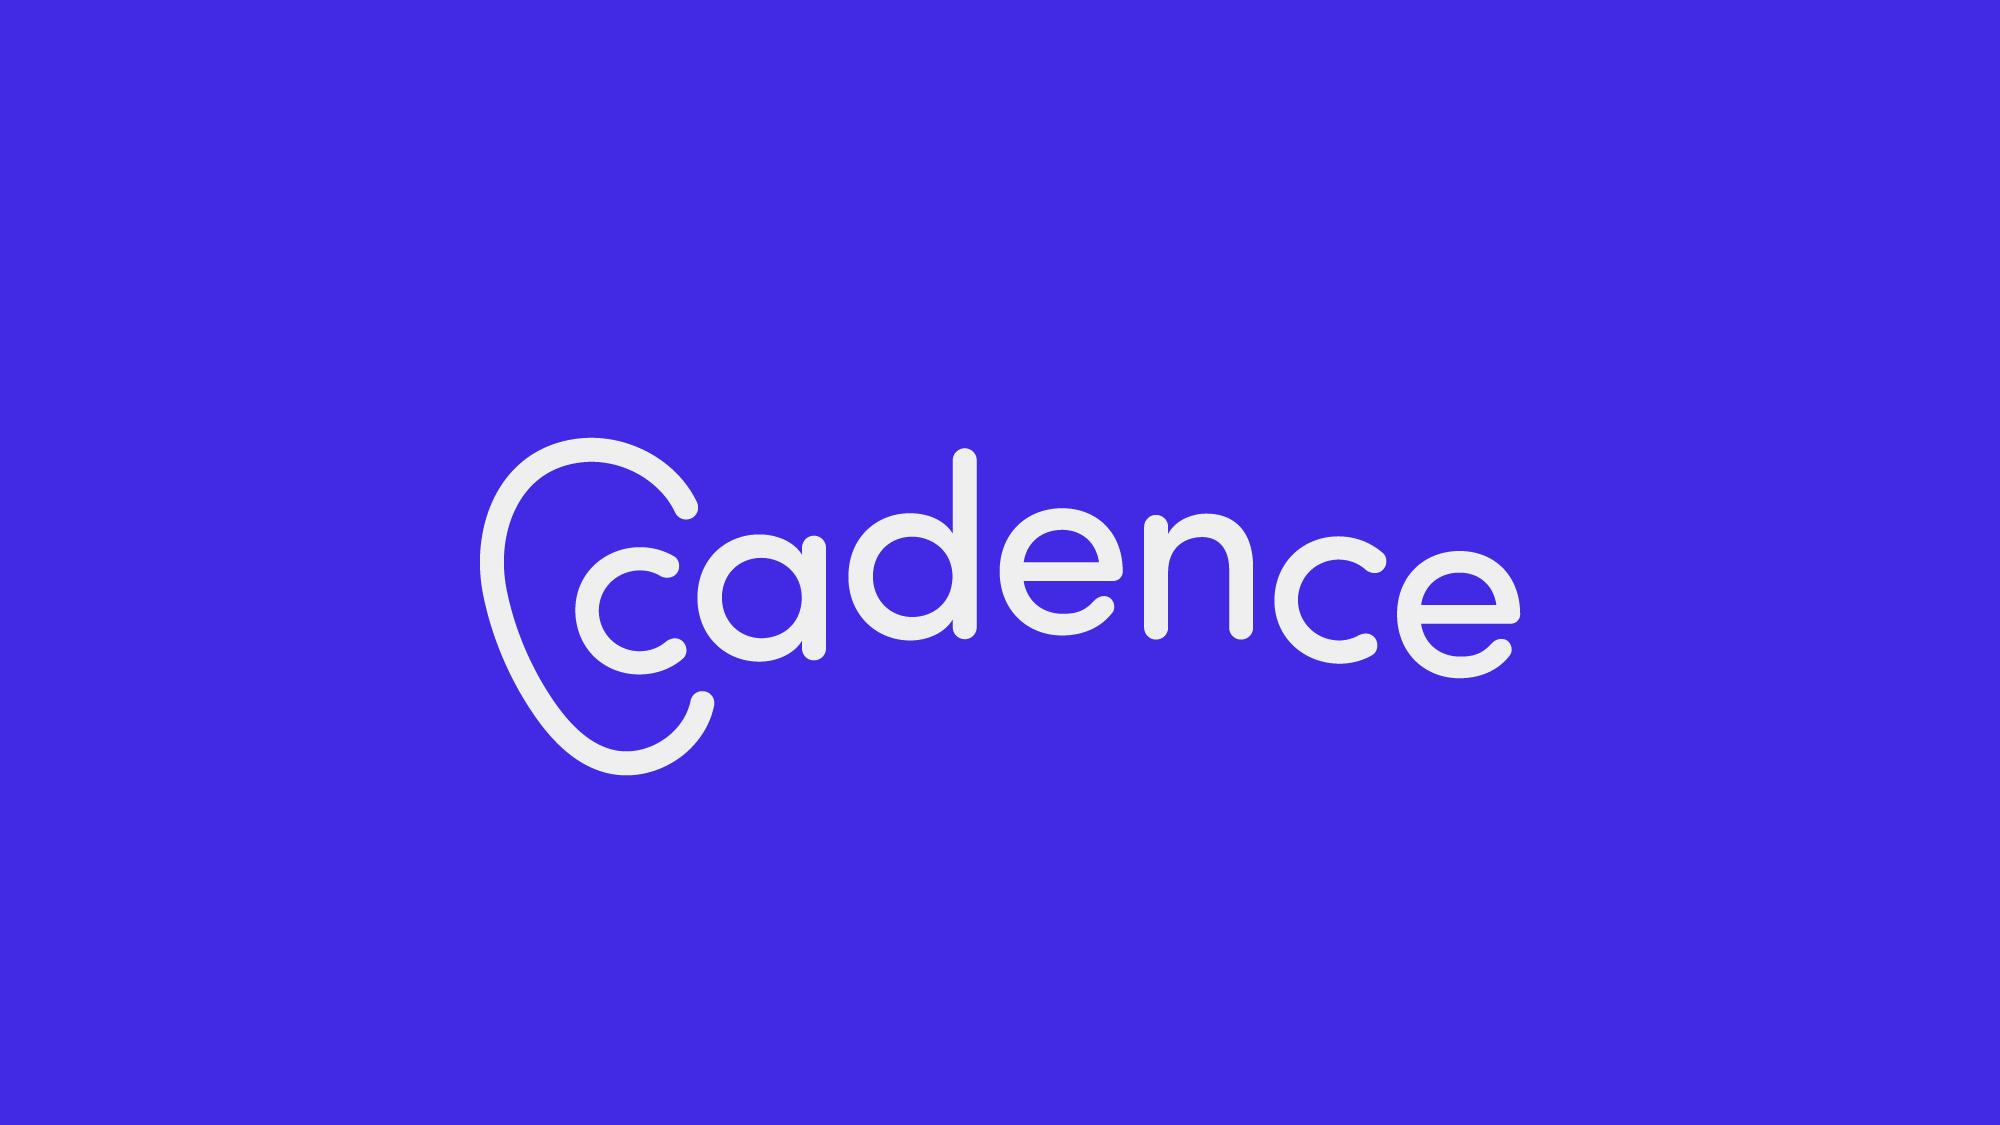 Cadence_Wordmark